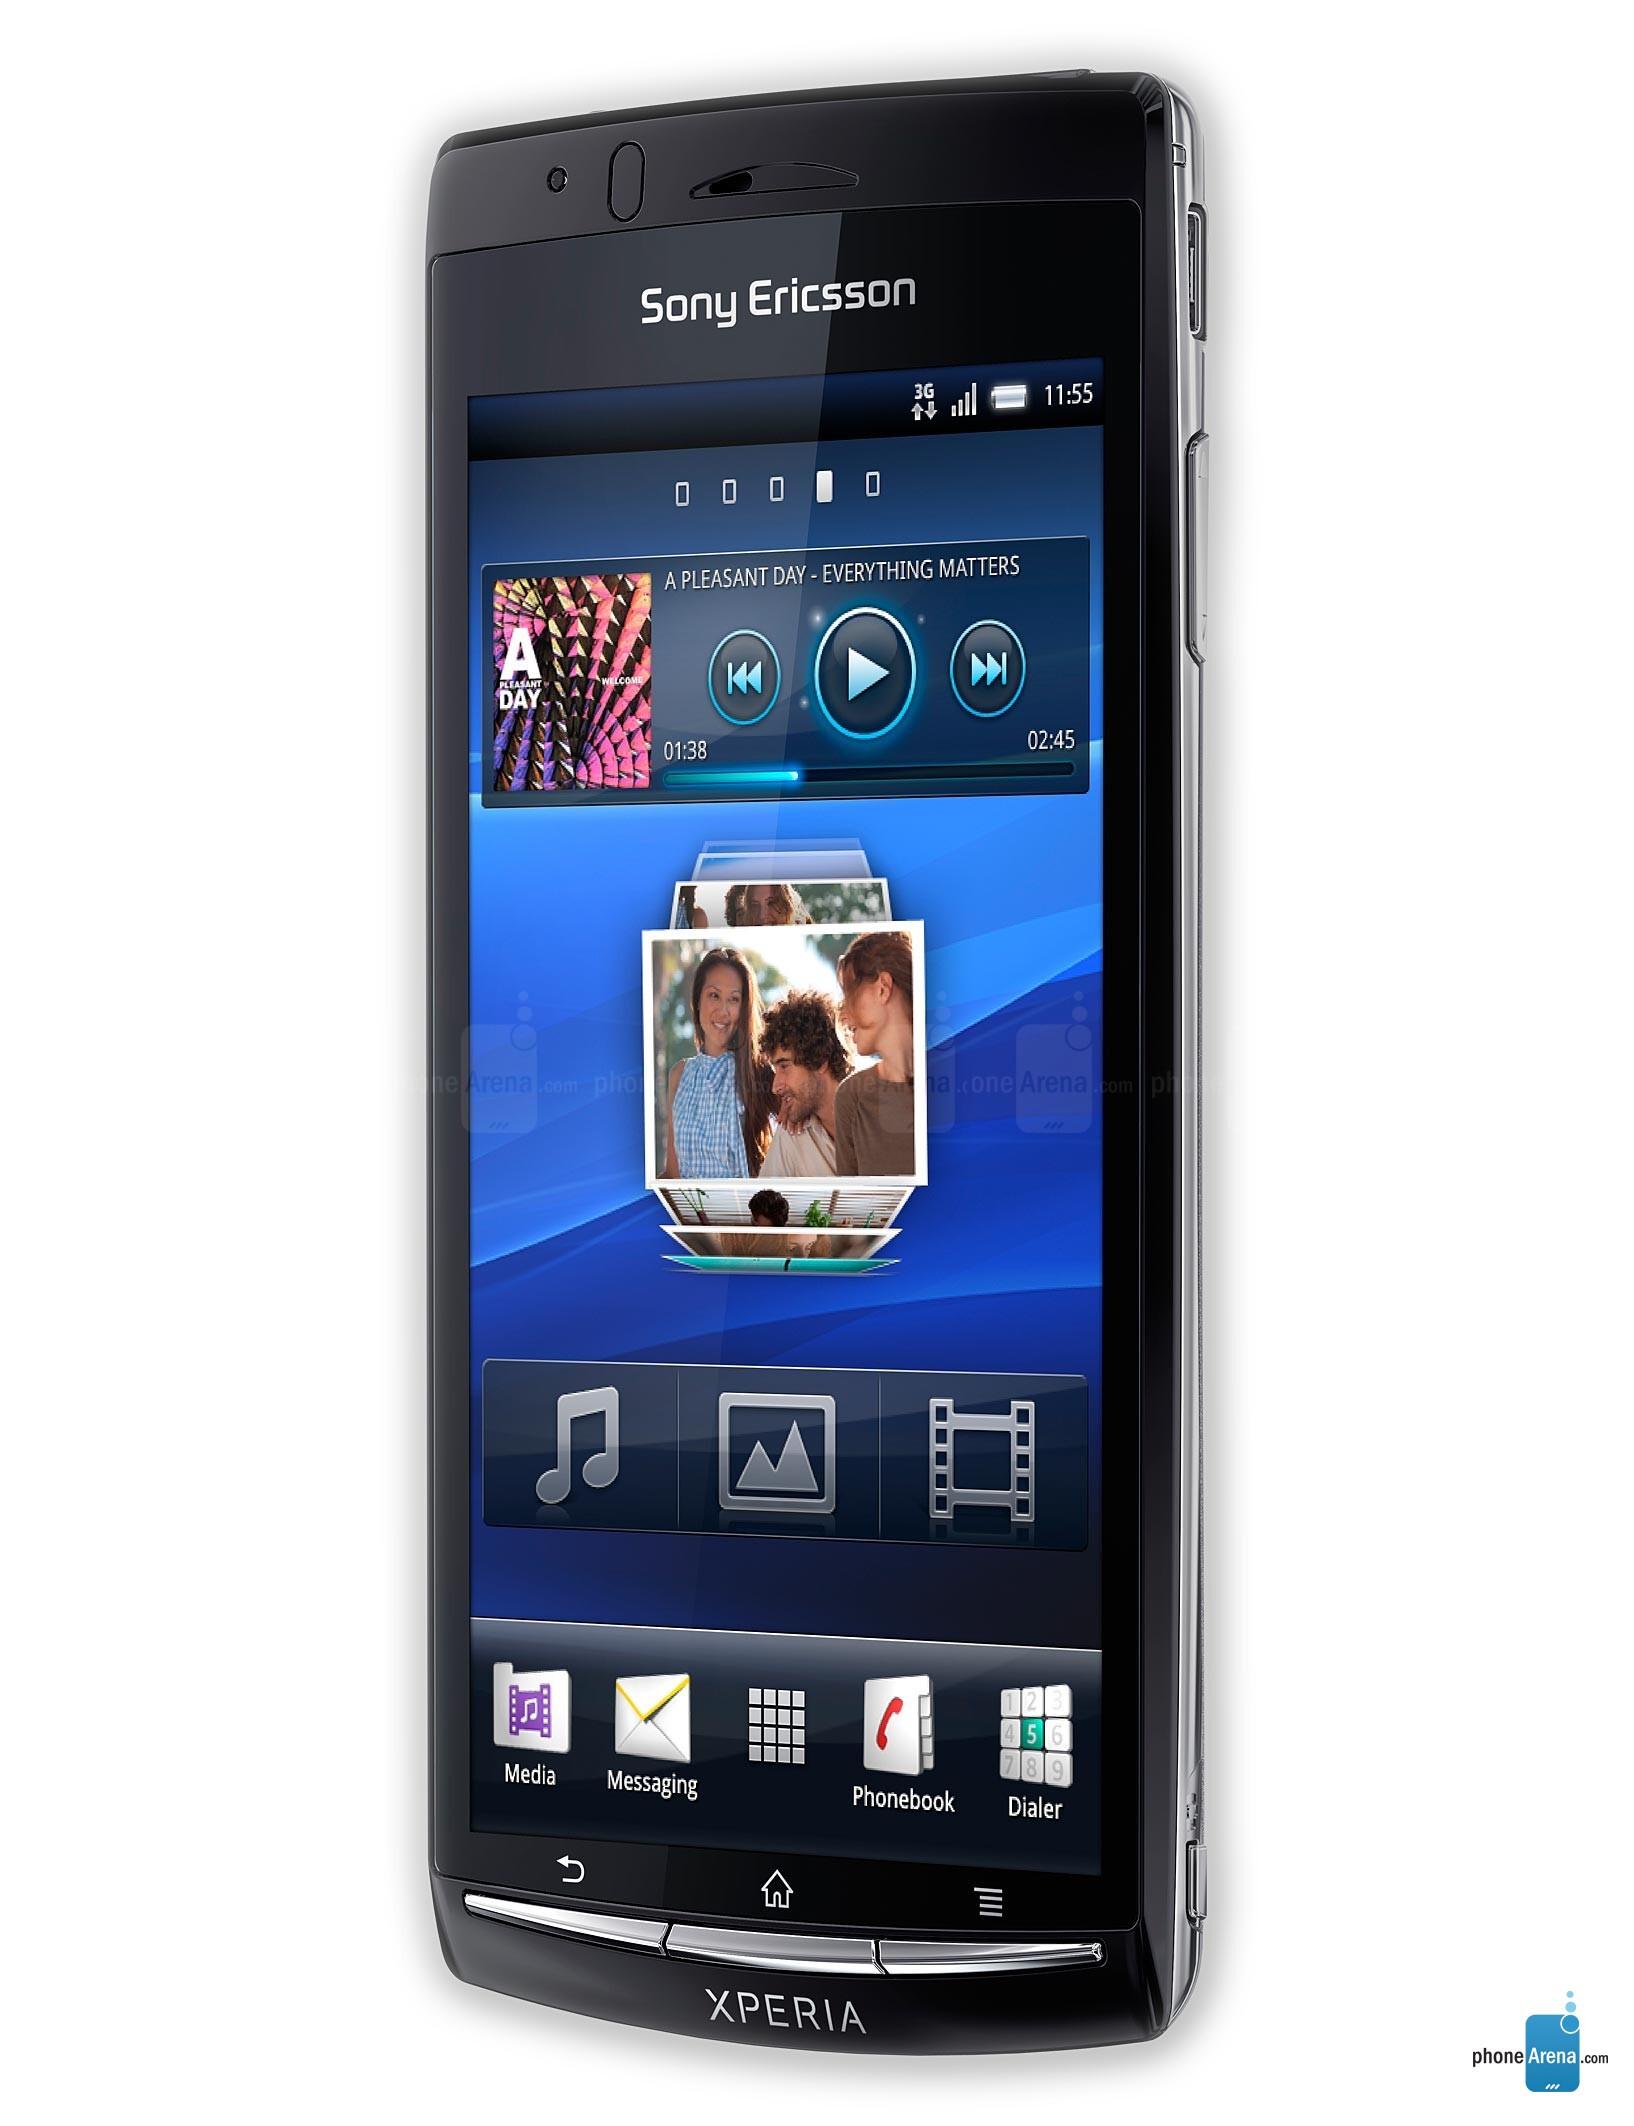 Sony Ericsson Xperia Arc Full Specs